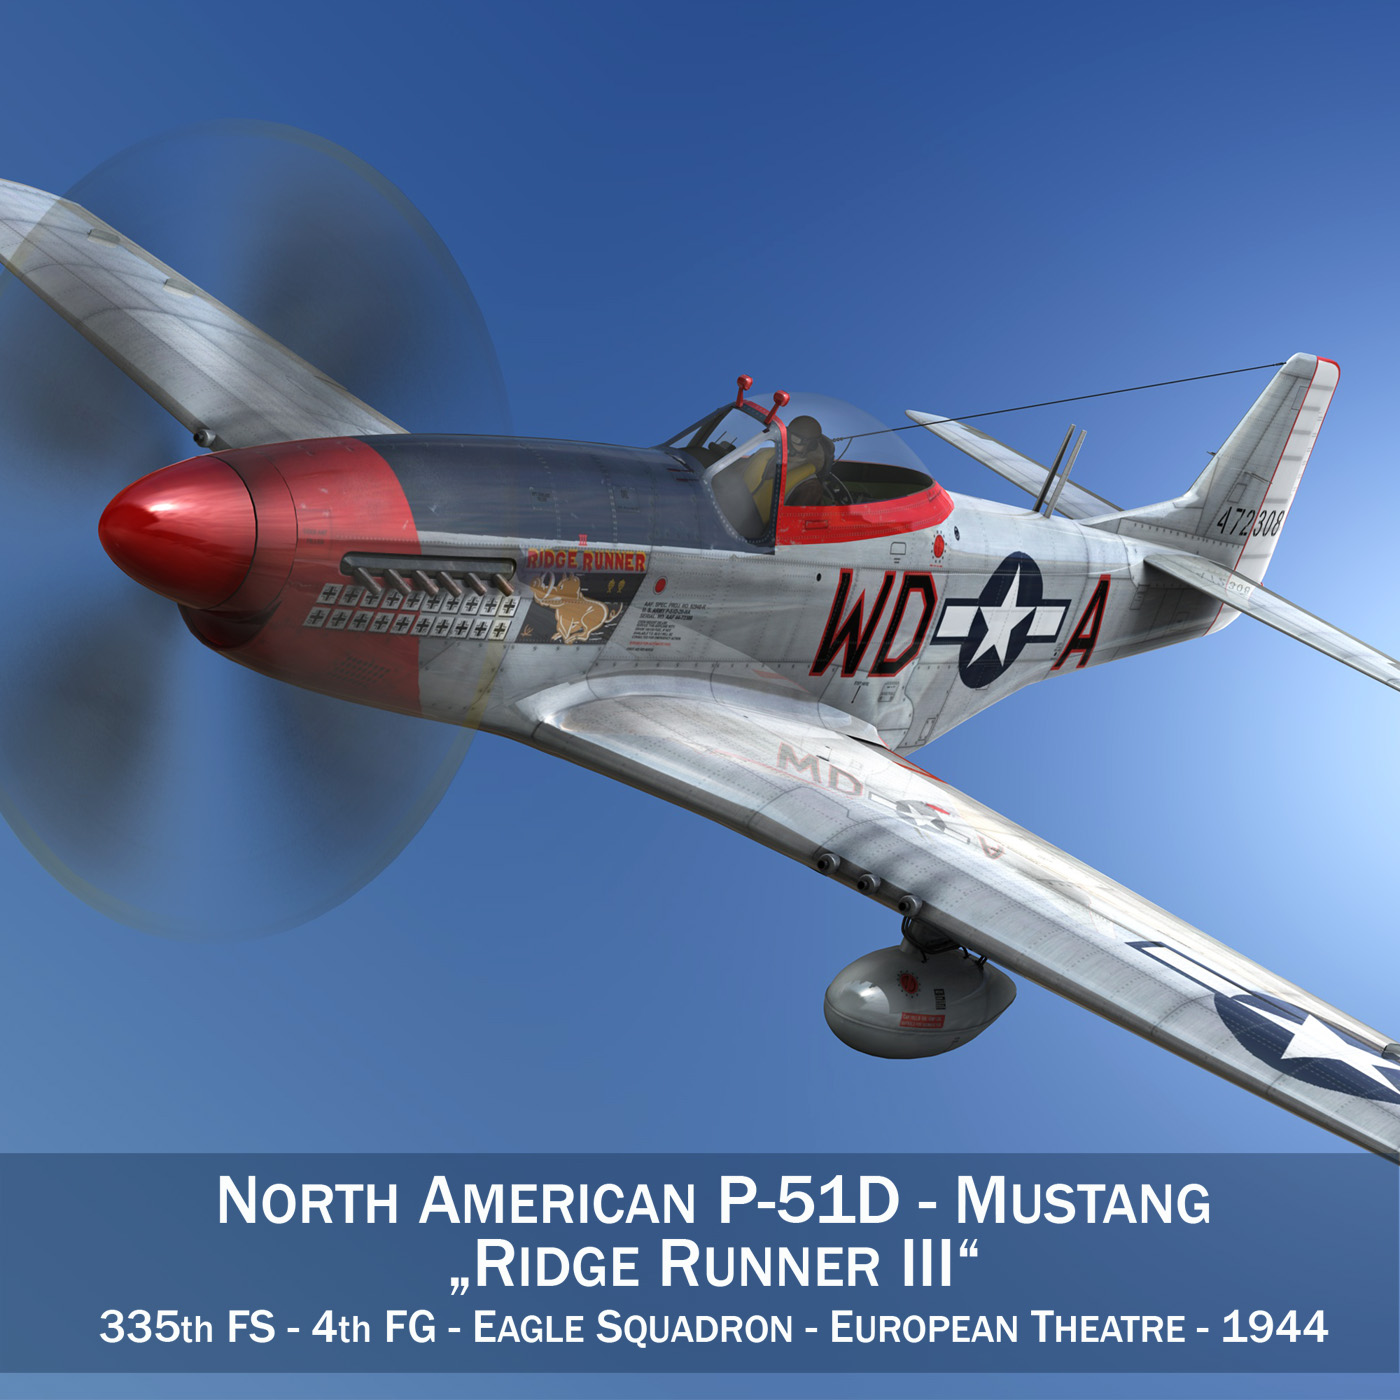 North American P-51D - Ridge Runner III 3d model fbx c4d lwo lws lw obj 282363